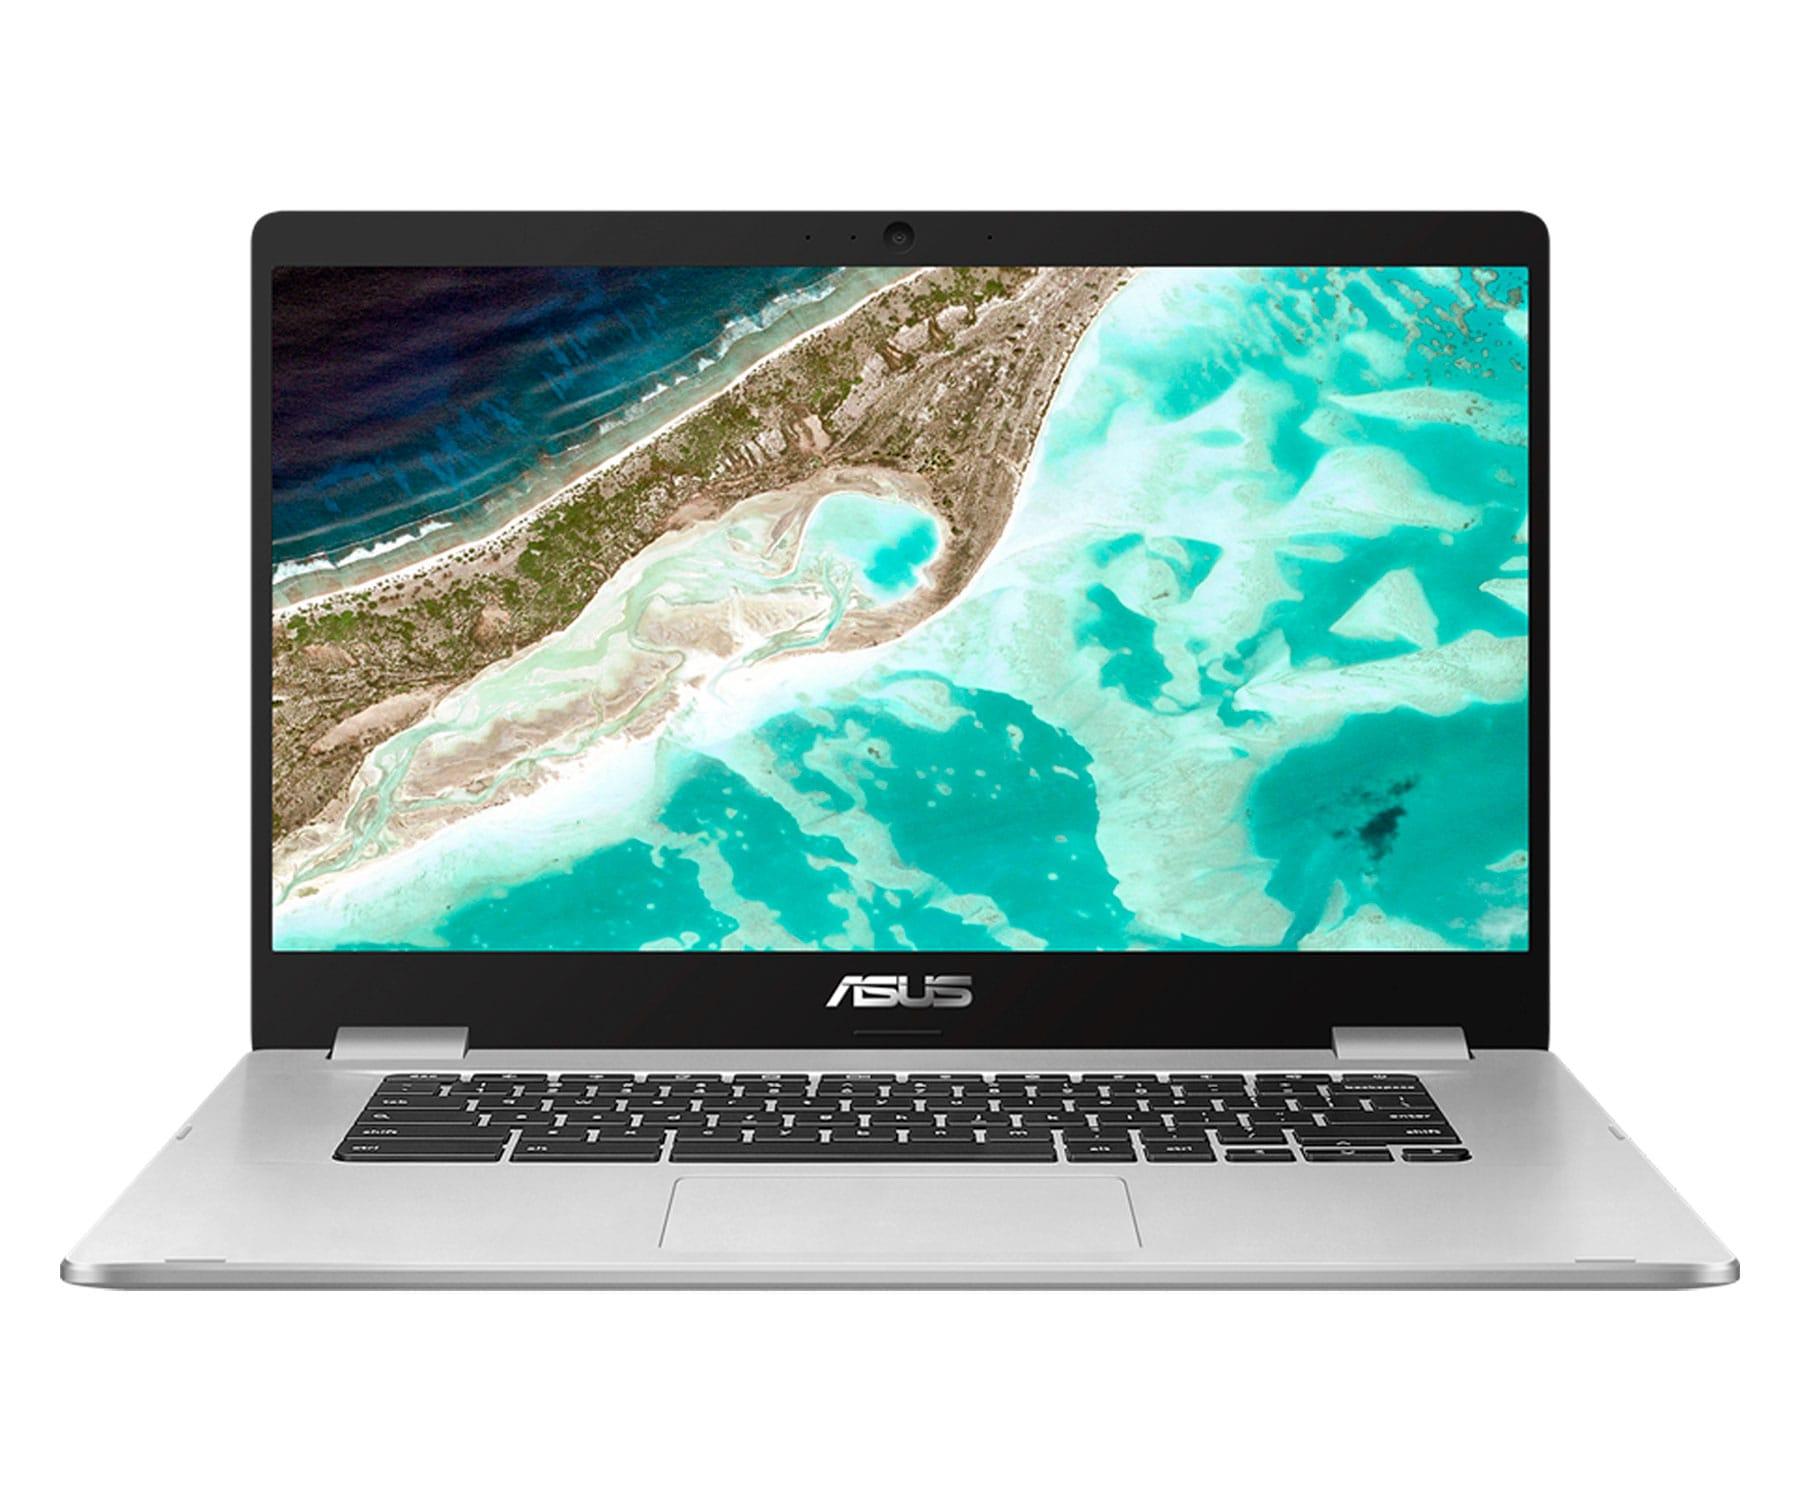 ASUS CHROMEBOOK Z1500CN INTEL CELERON, 8GB, 64GB